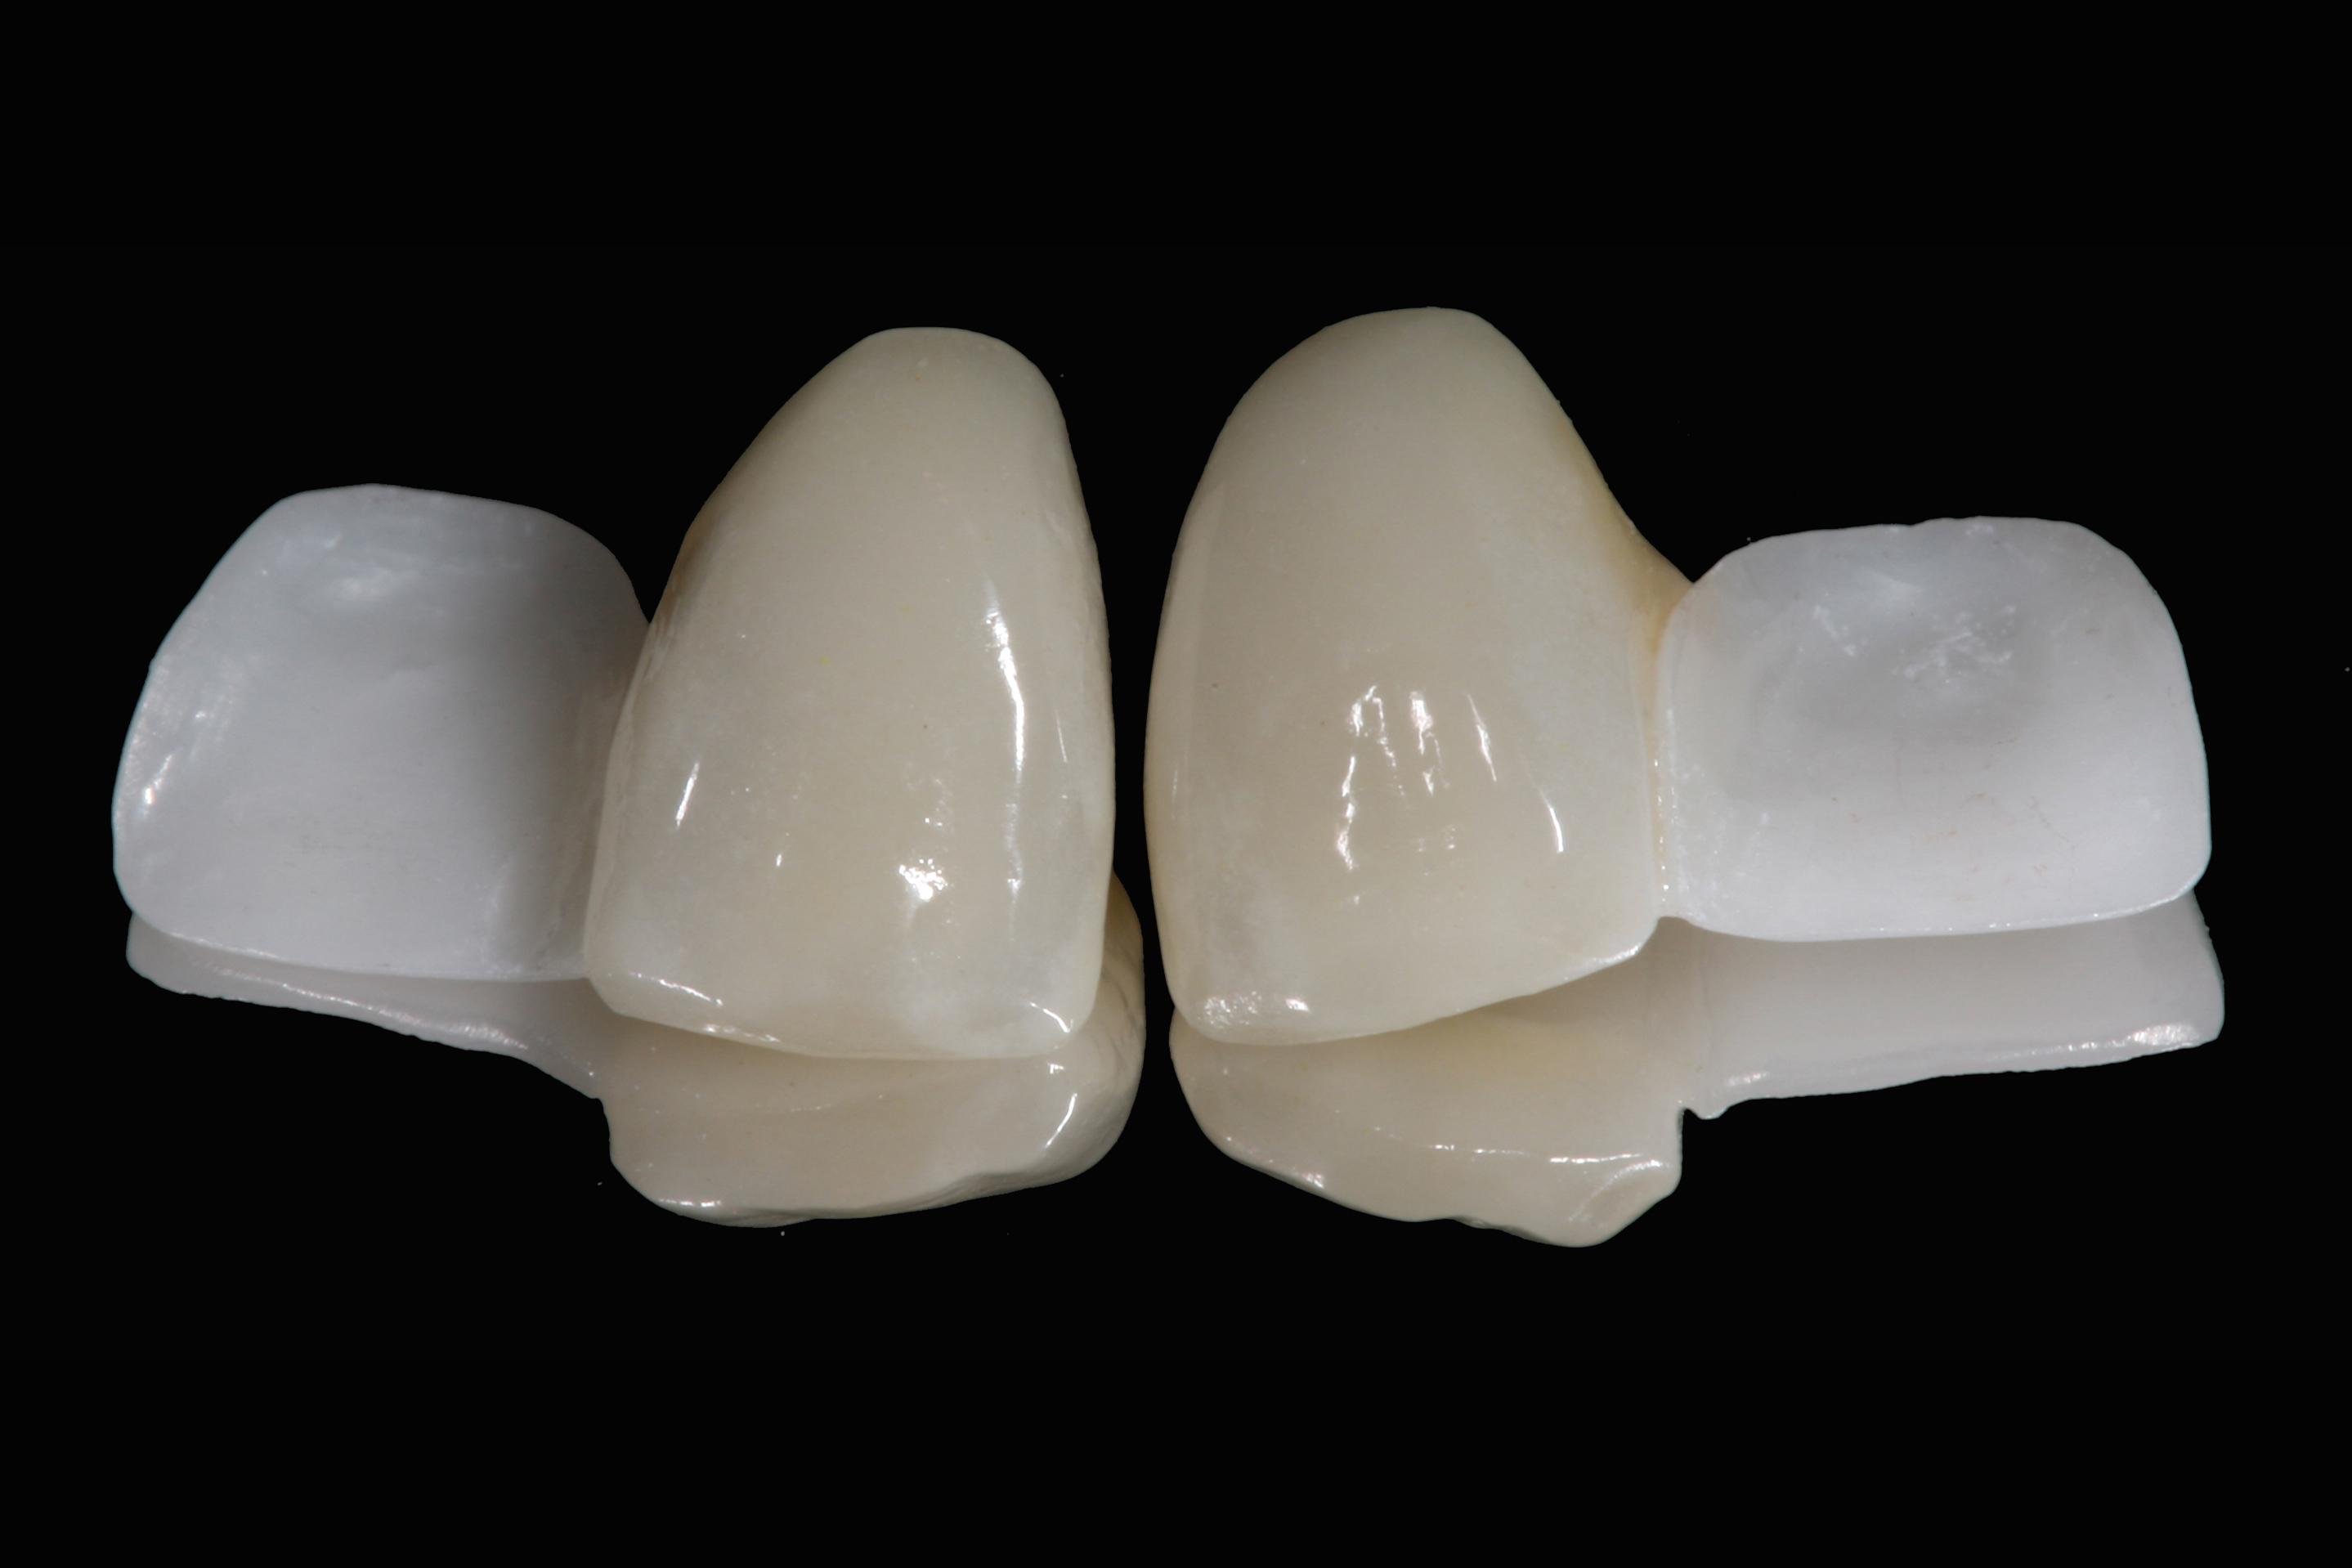 do flippers feellook natural please help!  Dental